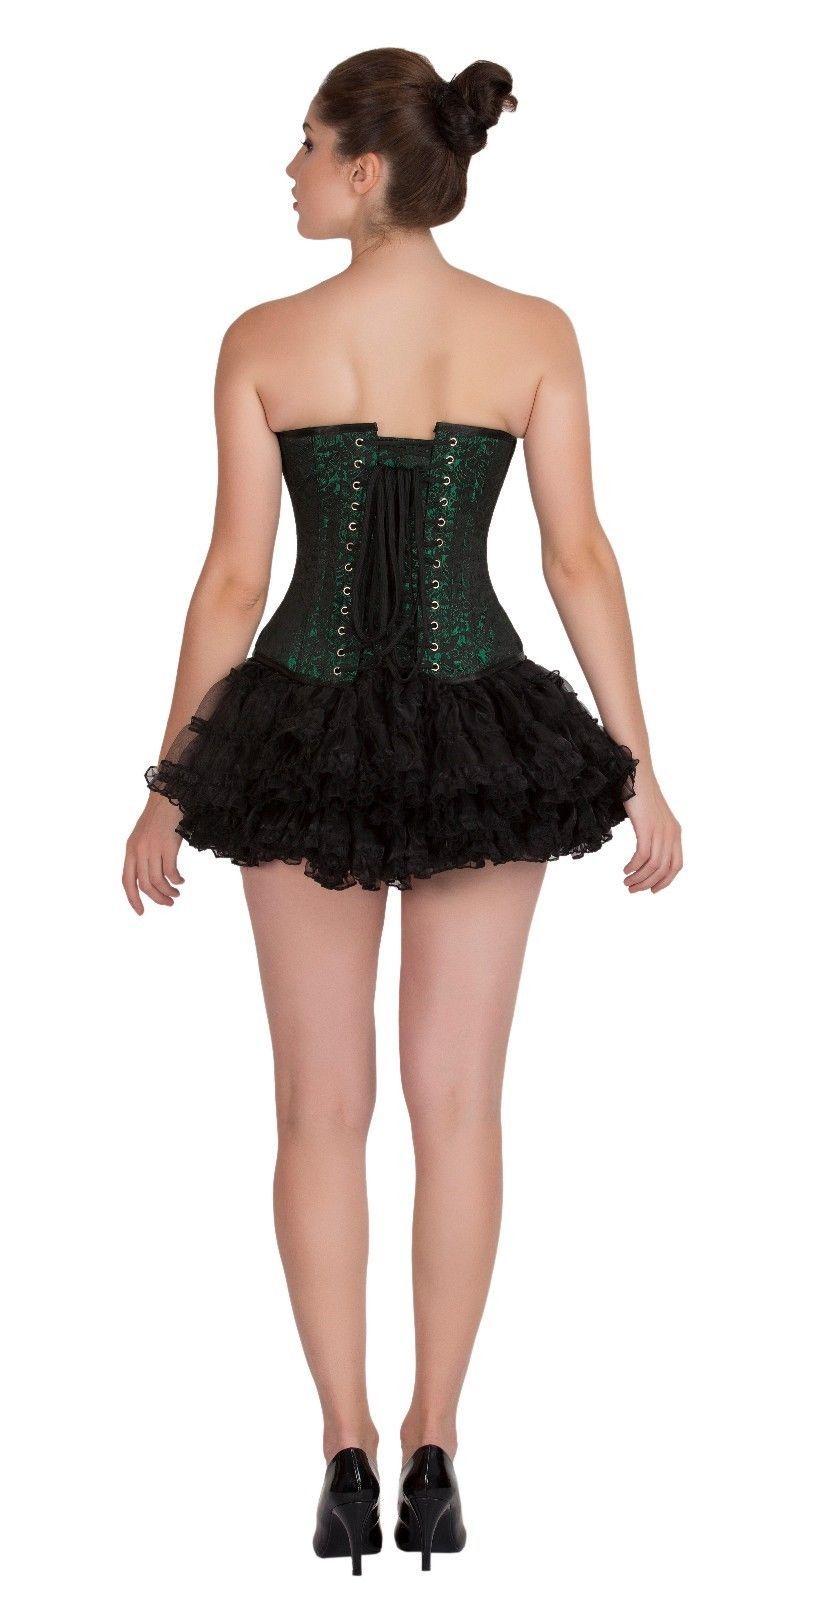 386dae0372b Green Black Brocade Gothic Burlesque Costume Tutu Skirt Overbust Corset  Dress